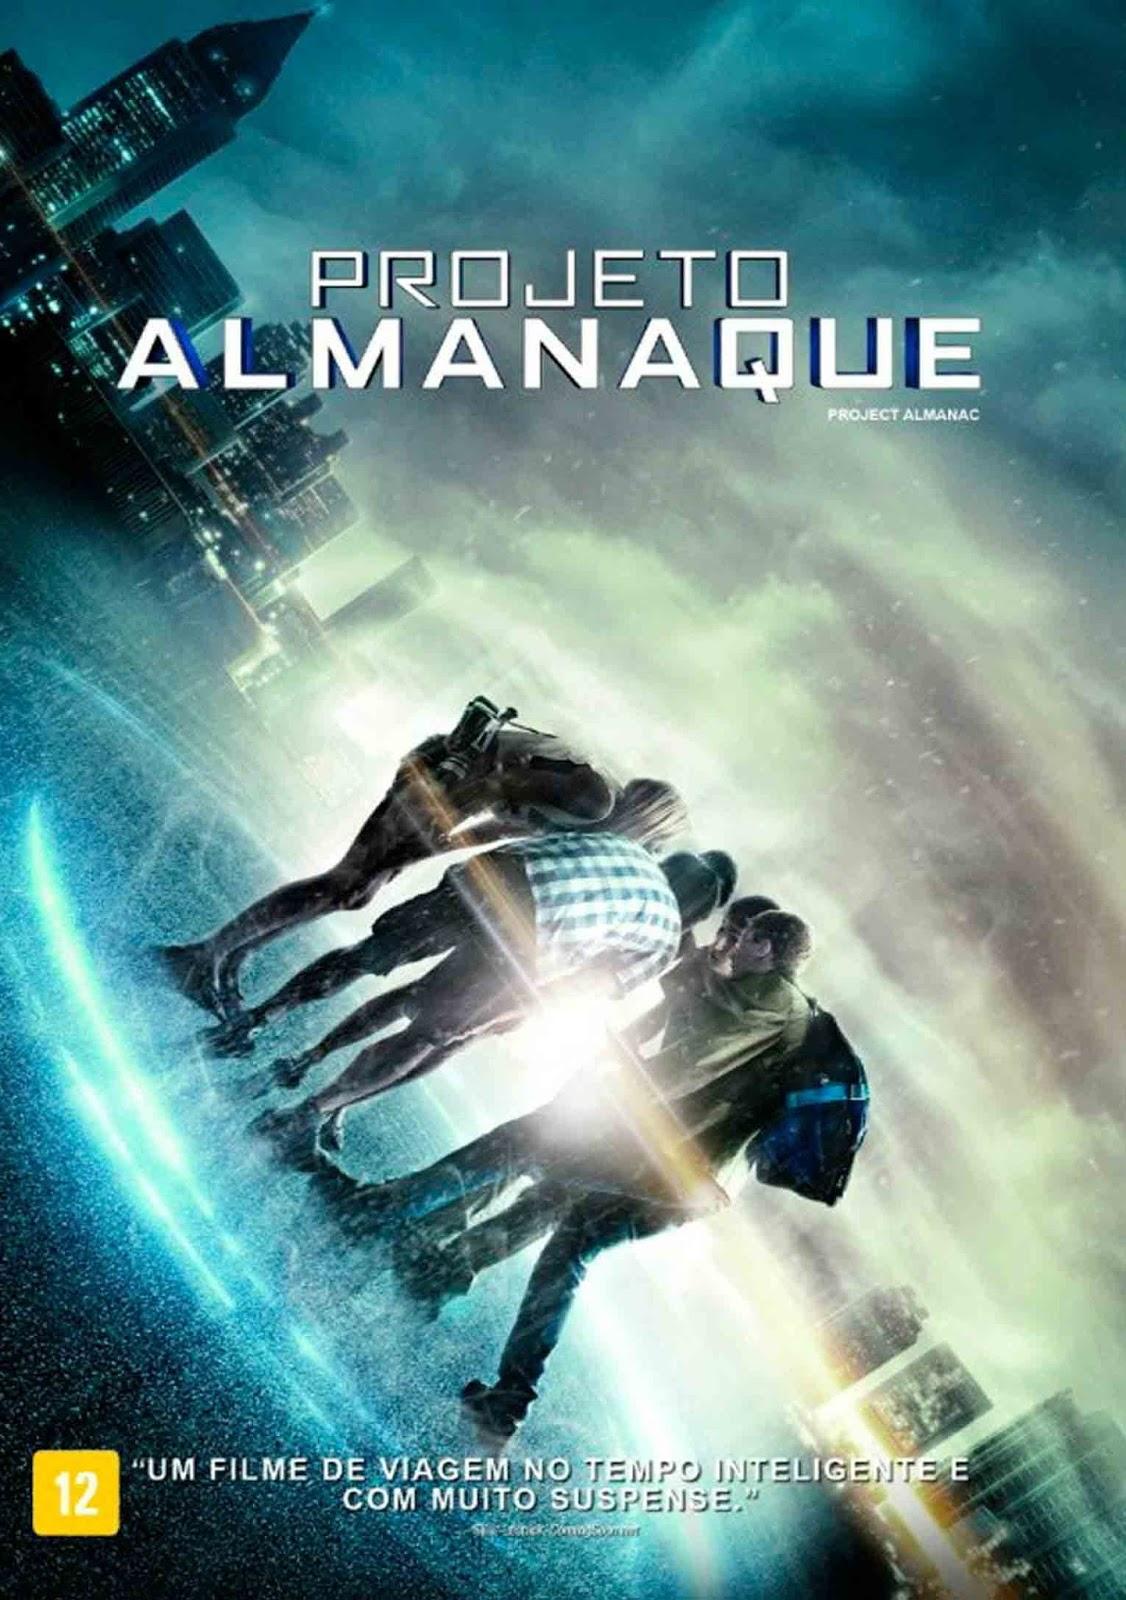 Projeto Almanaque Torrent - Blu-ray Rip 720p Dual Áudio (2015)